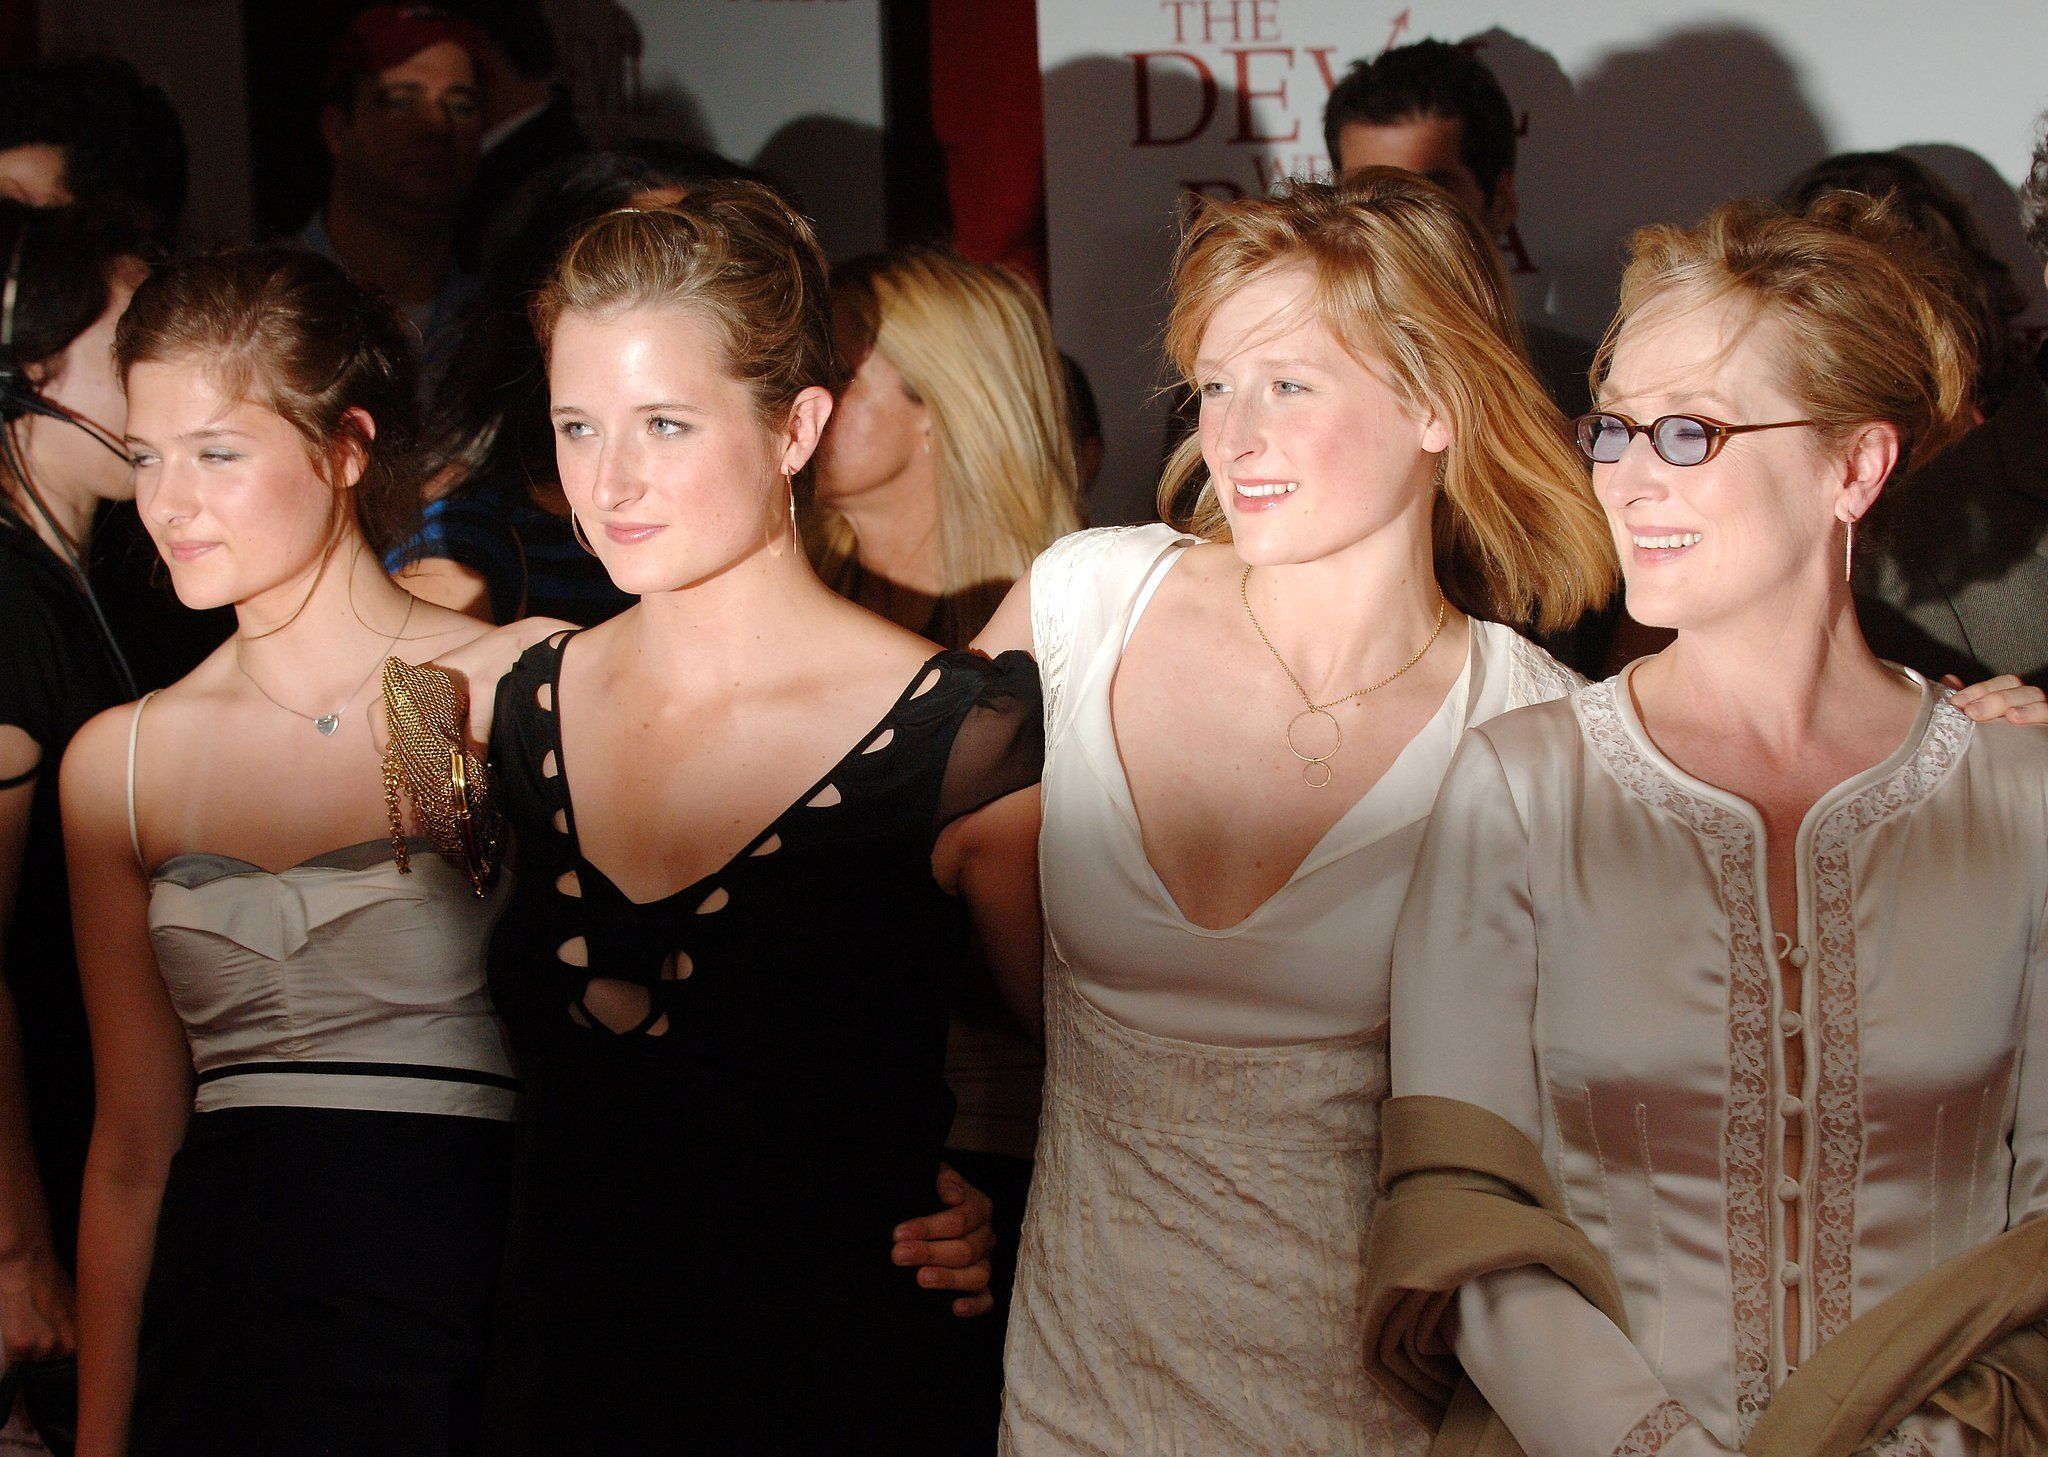 pregnant meryl streep - Hledat Googlem | Meryl Streep ...